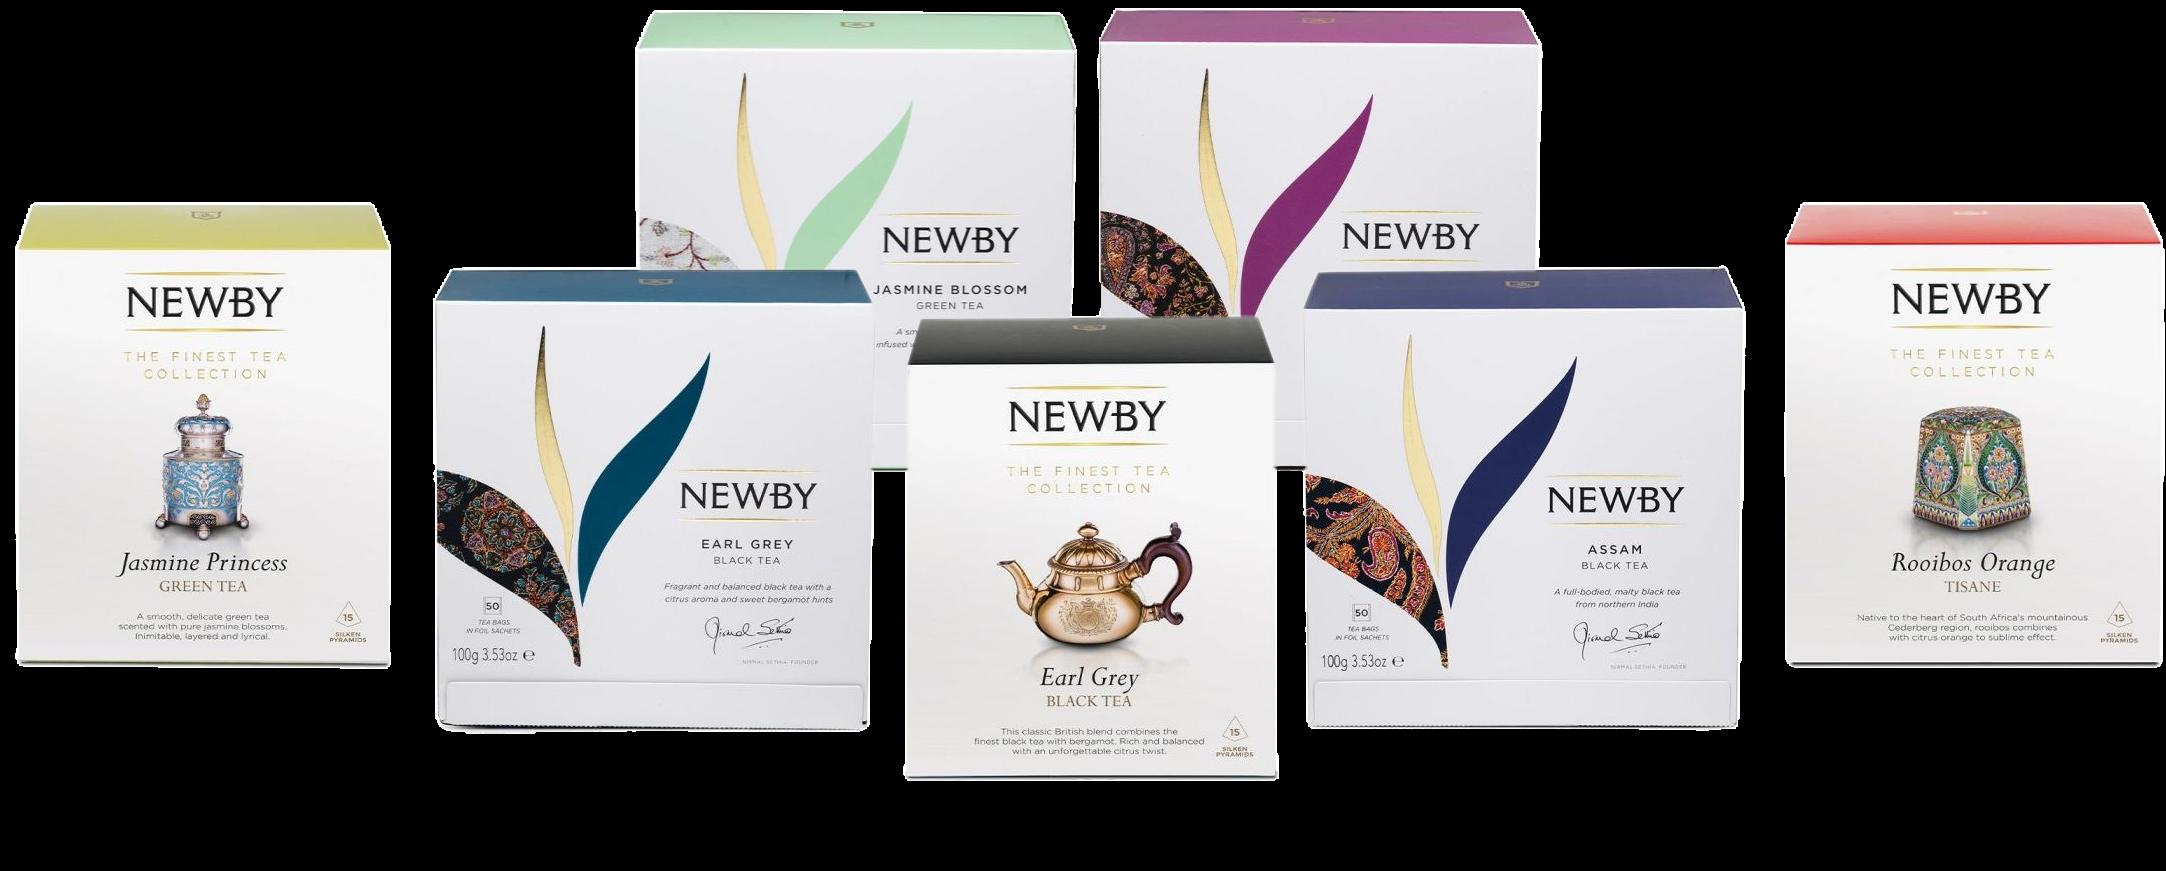 Newby Te